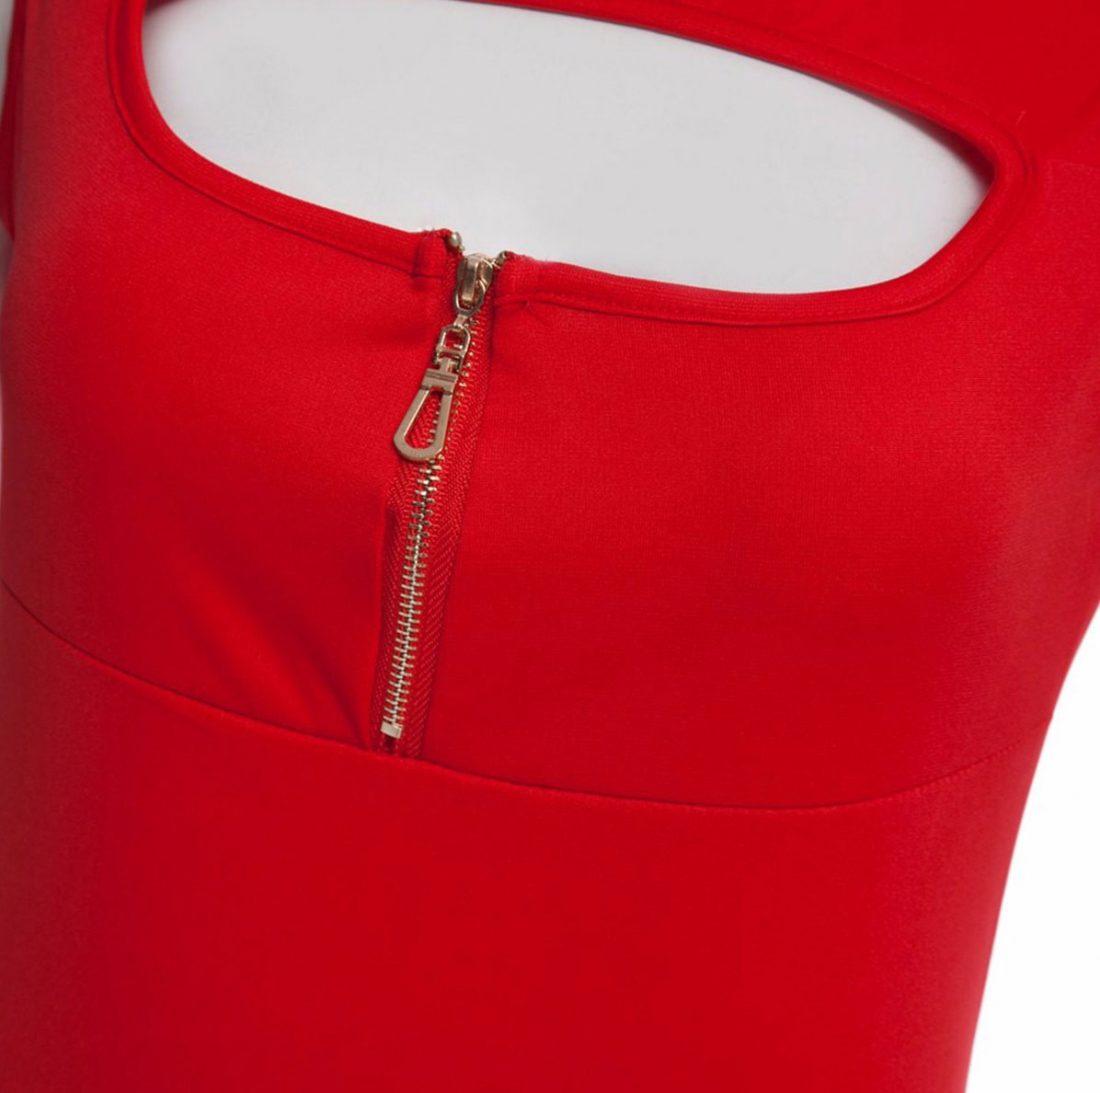 M0176 red3 Party Dresses maureens.com boutique